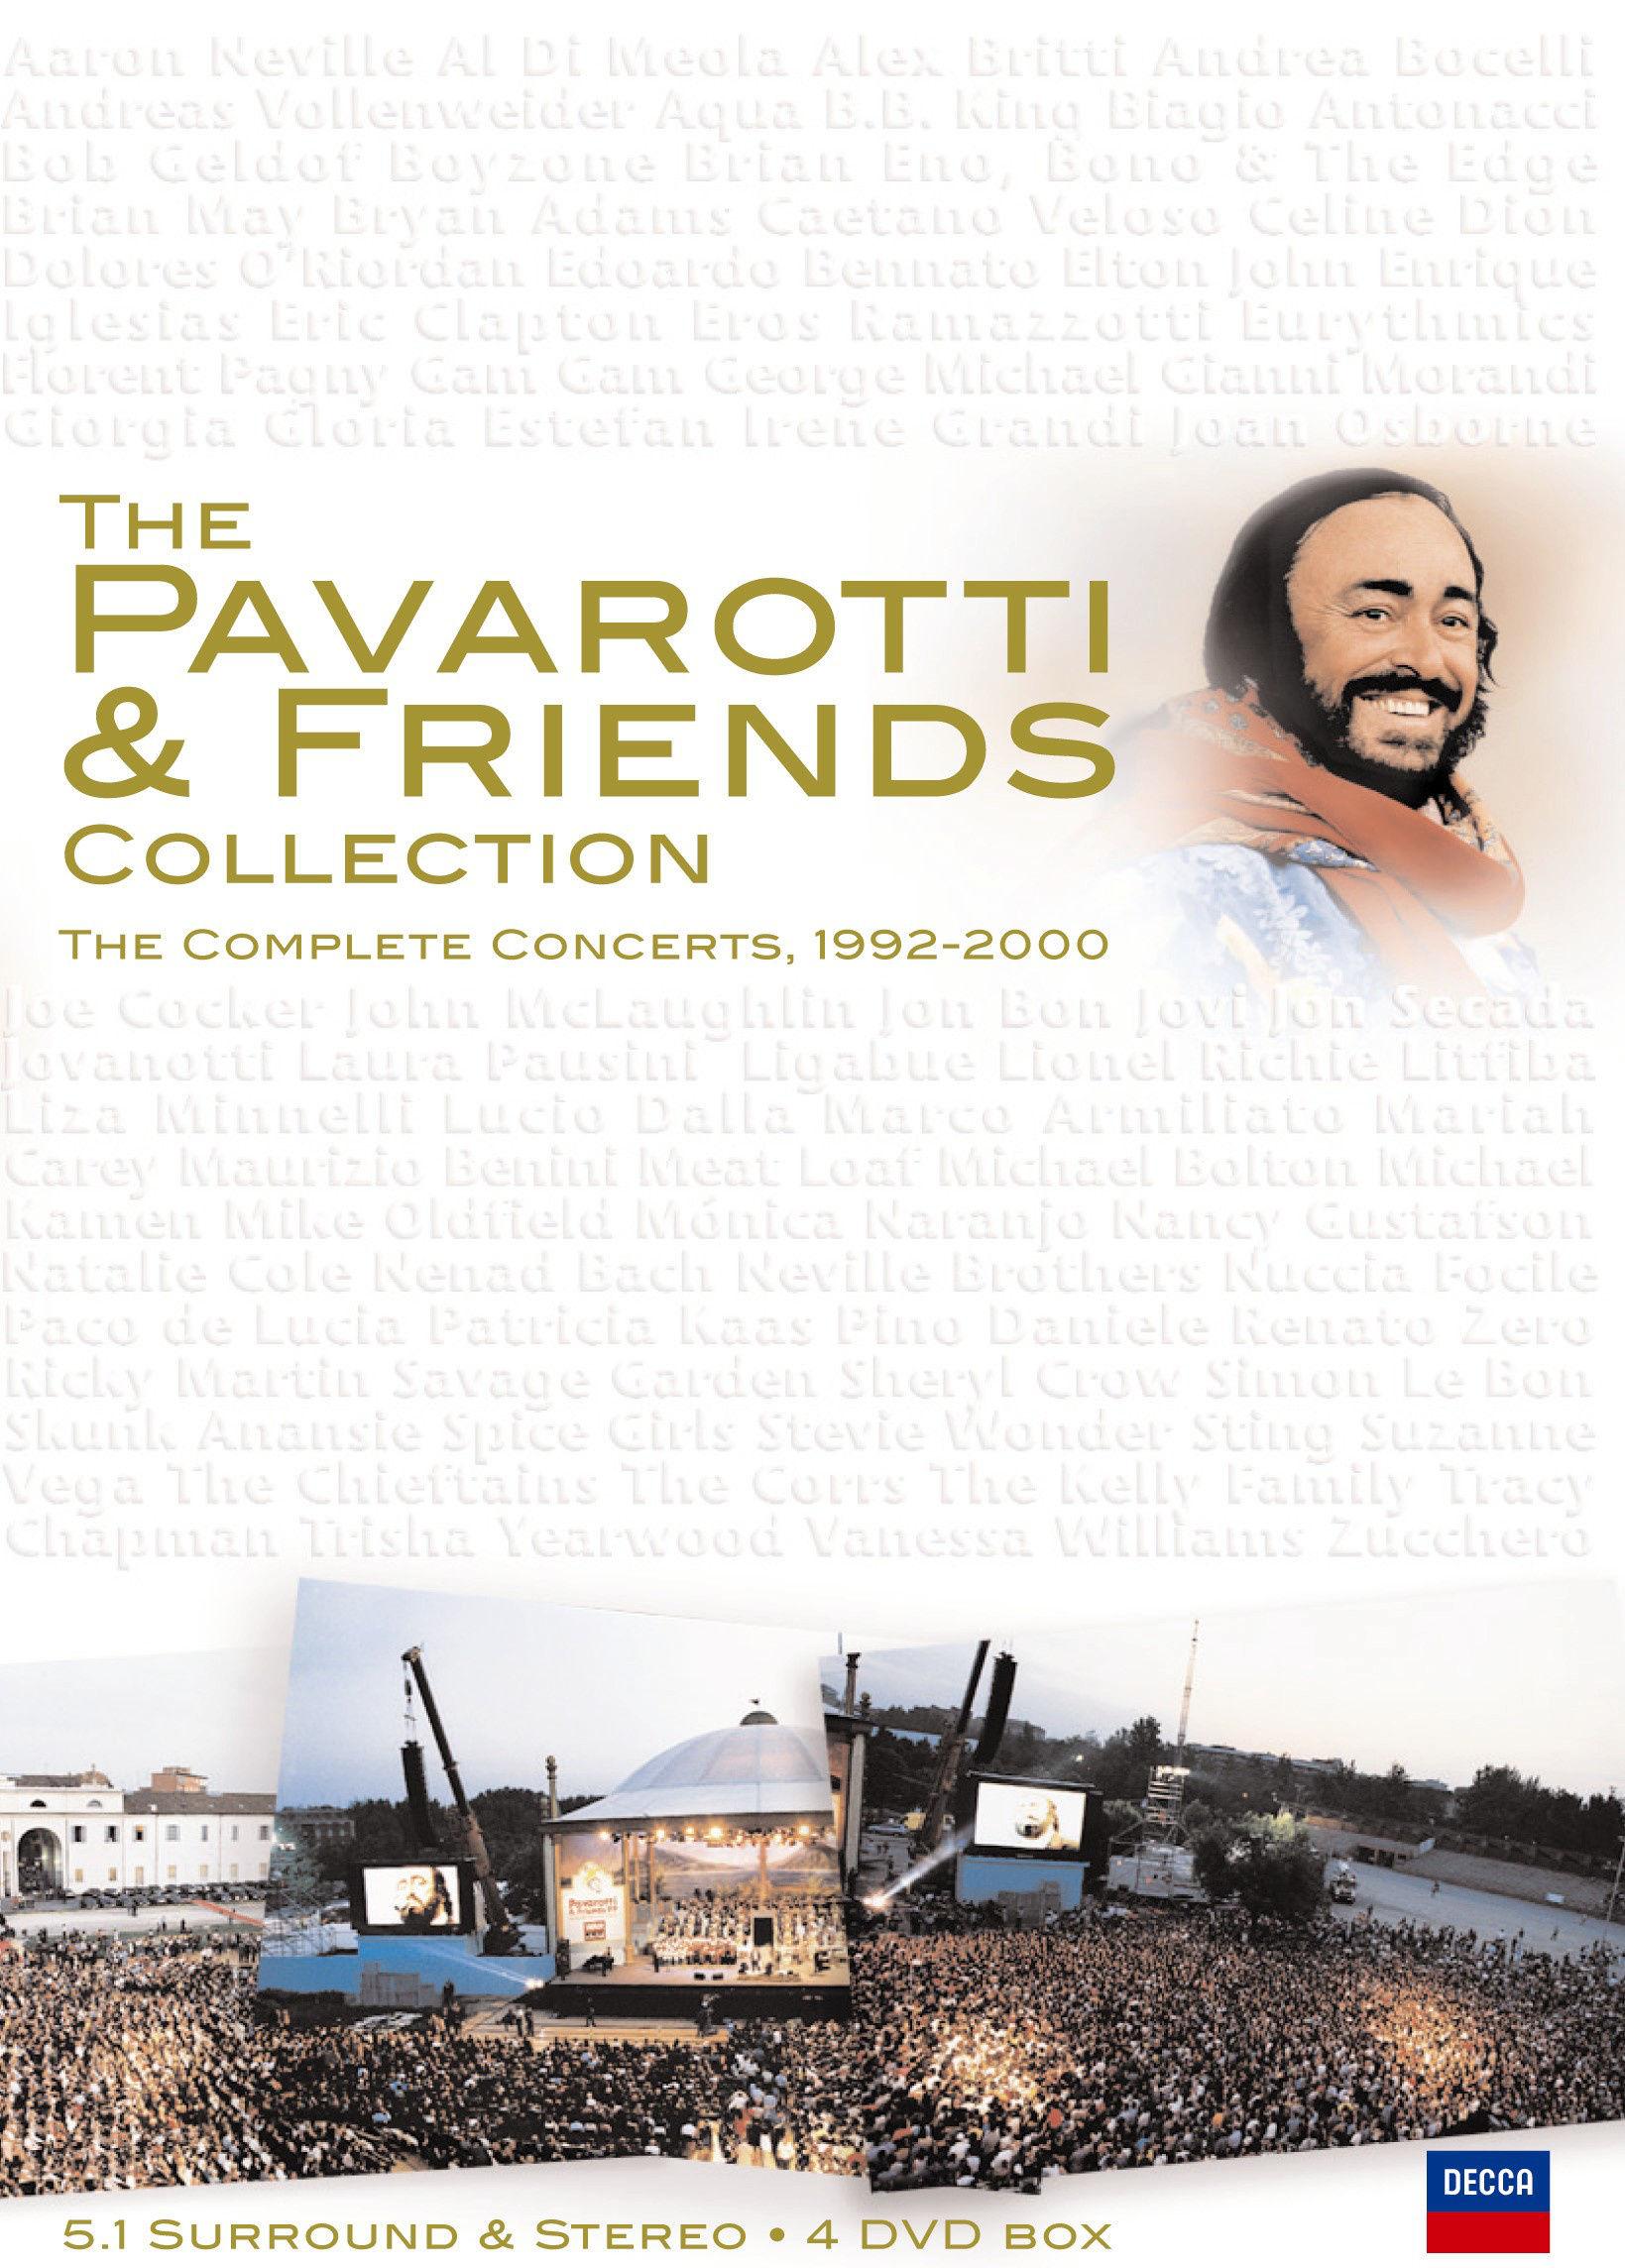 The Pavarotti & Friends